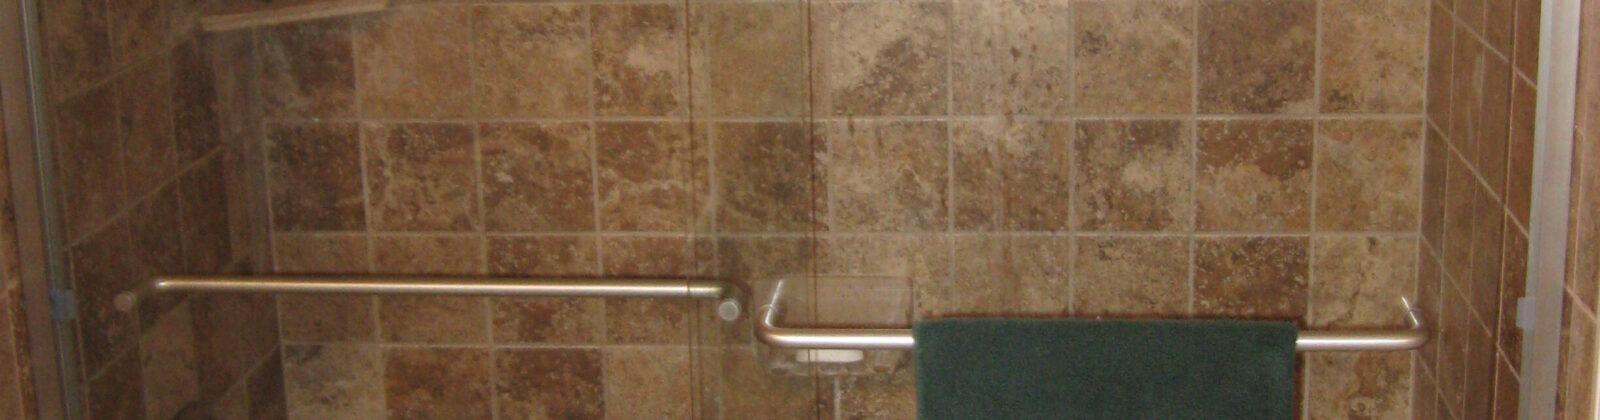 Ventura Bathtub Installs Tub Plumbing Repair Door Installs - Bathroom remodel ventura ca